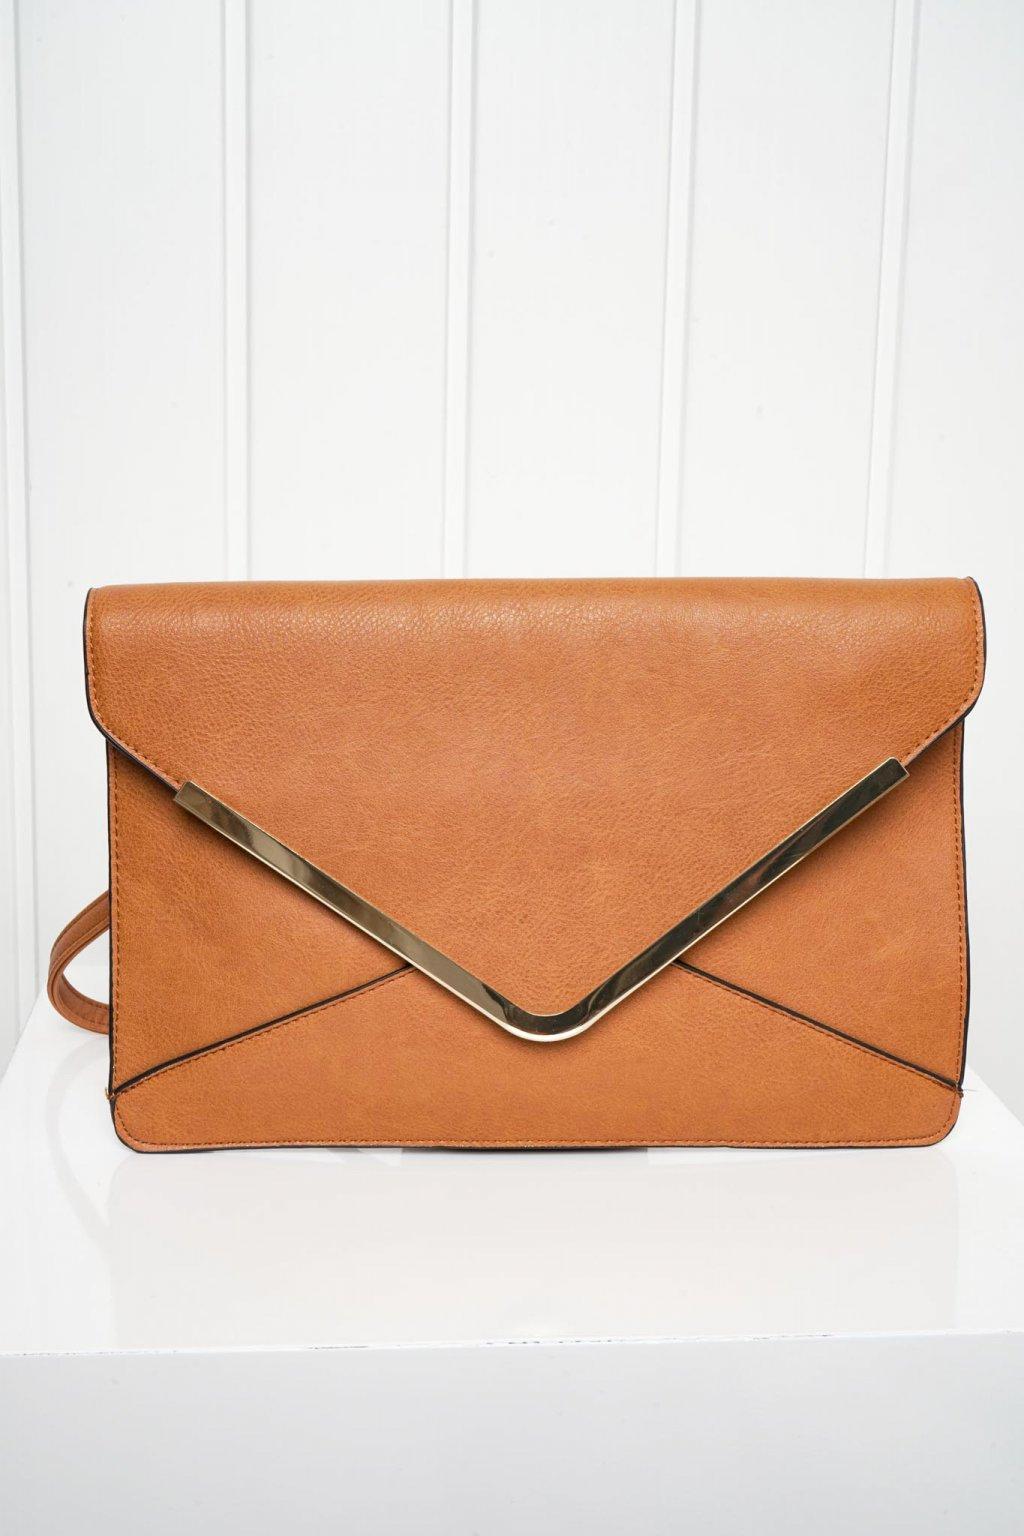 Kabelka, crossbody, ruksak, shopping bag, shopperka, 601